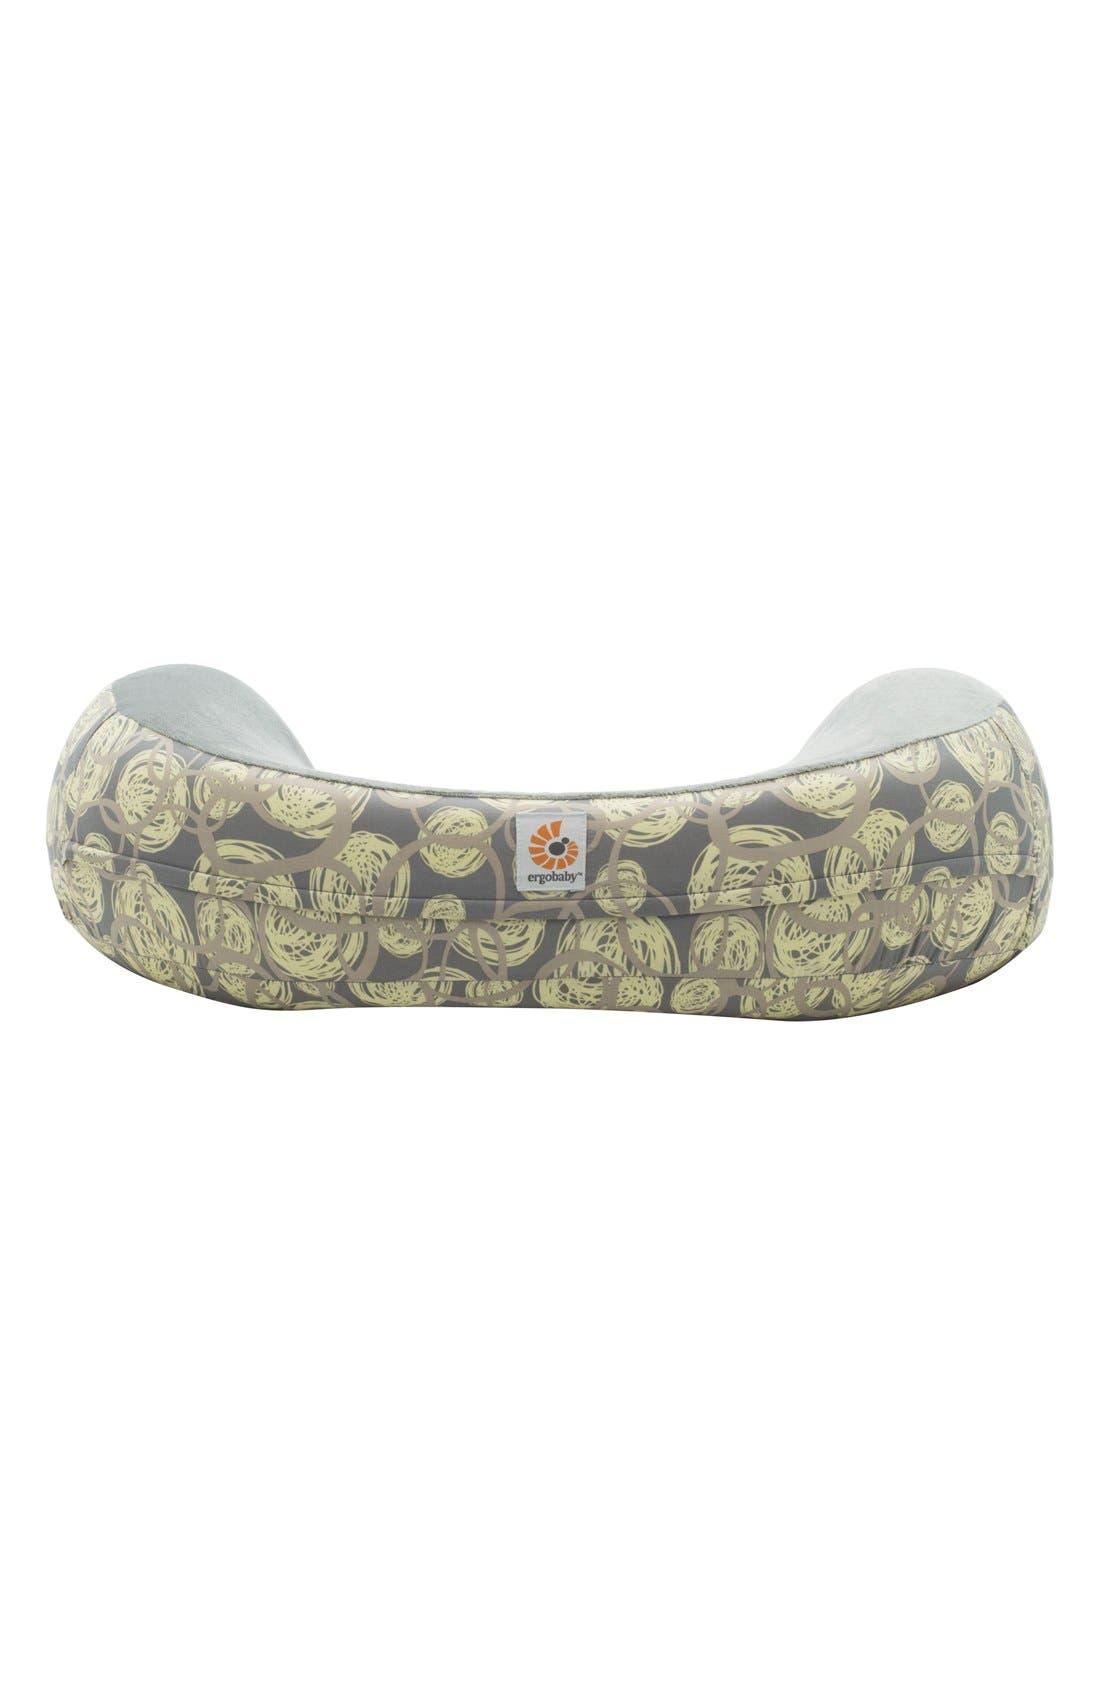 ERGObaby 'Natural Curve™' Nursing Pillow Cover